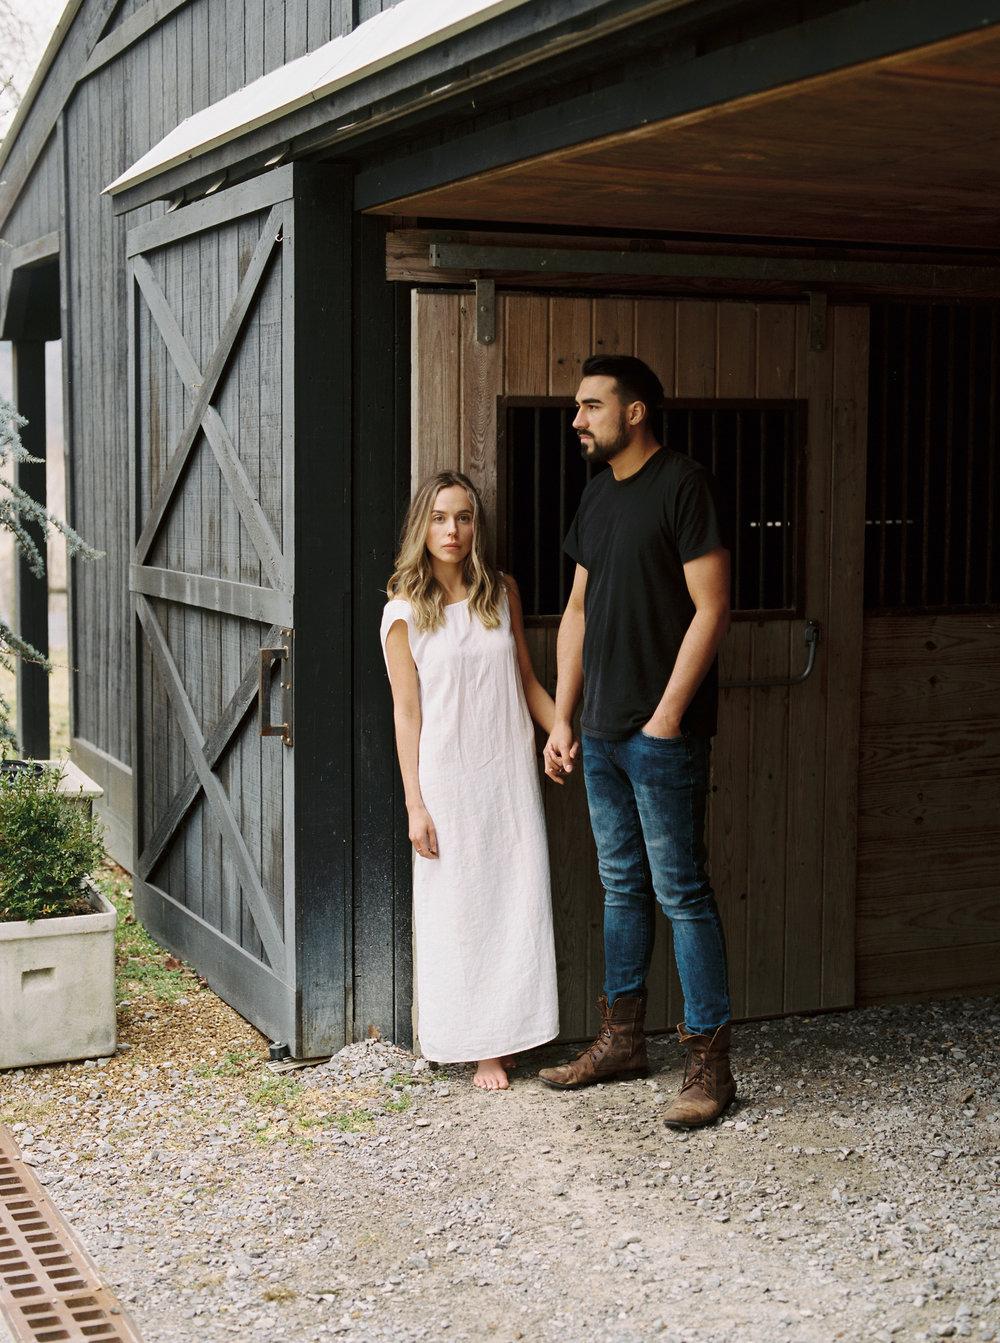 Kyle John l Fine Art Wedding Photography l Chicago, Copenhagen, California, New York, Destination l Blog l Jessica Sloane_Bloomsbury Farm_Nashville_23